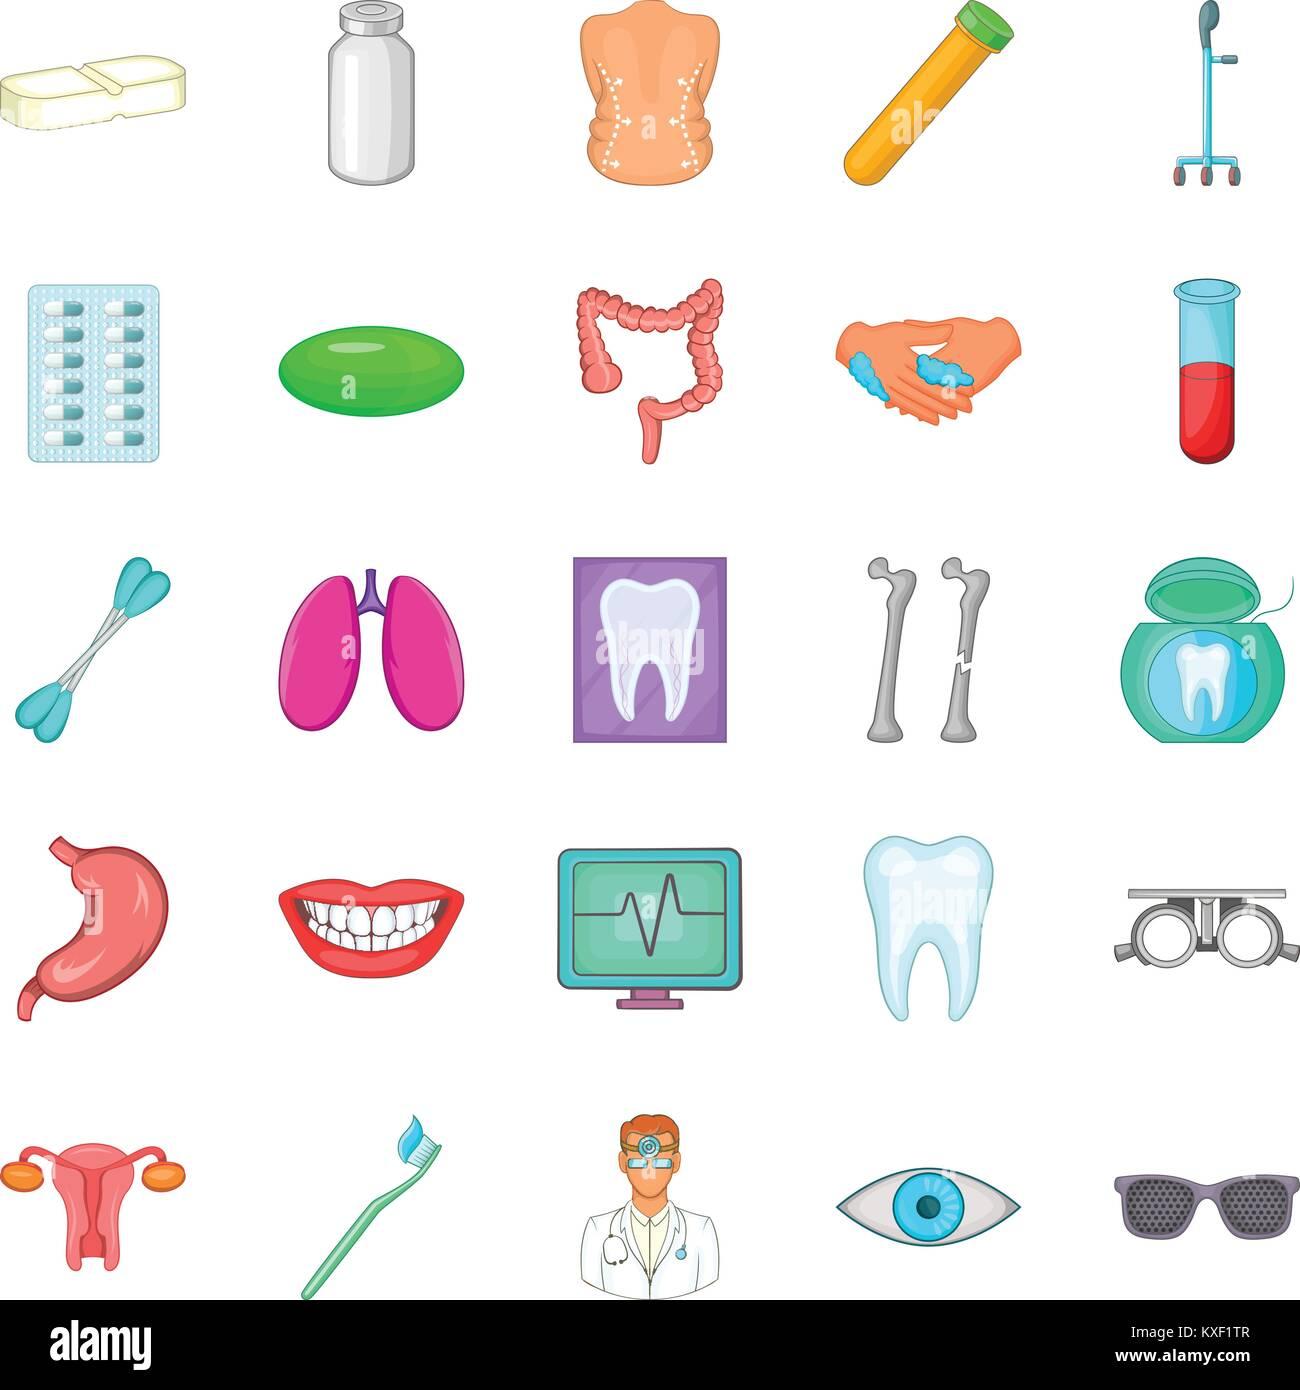 Krankheit, Symbole, Cartoon Stil Stockbild